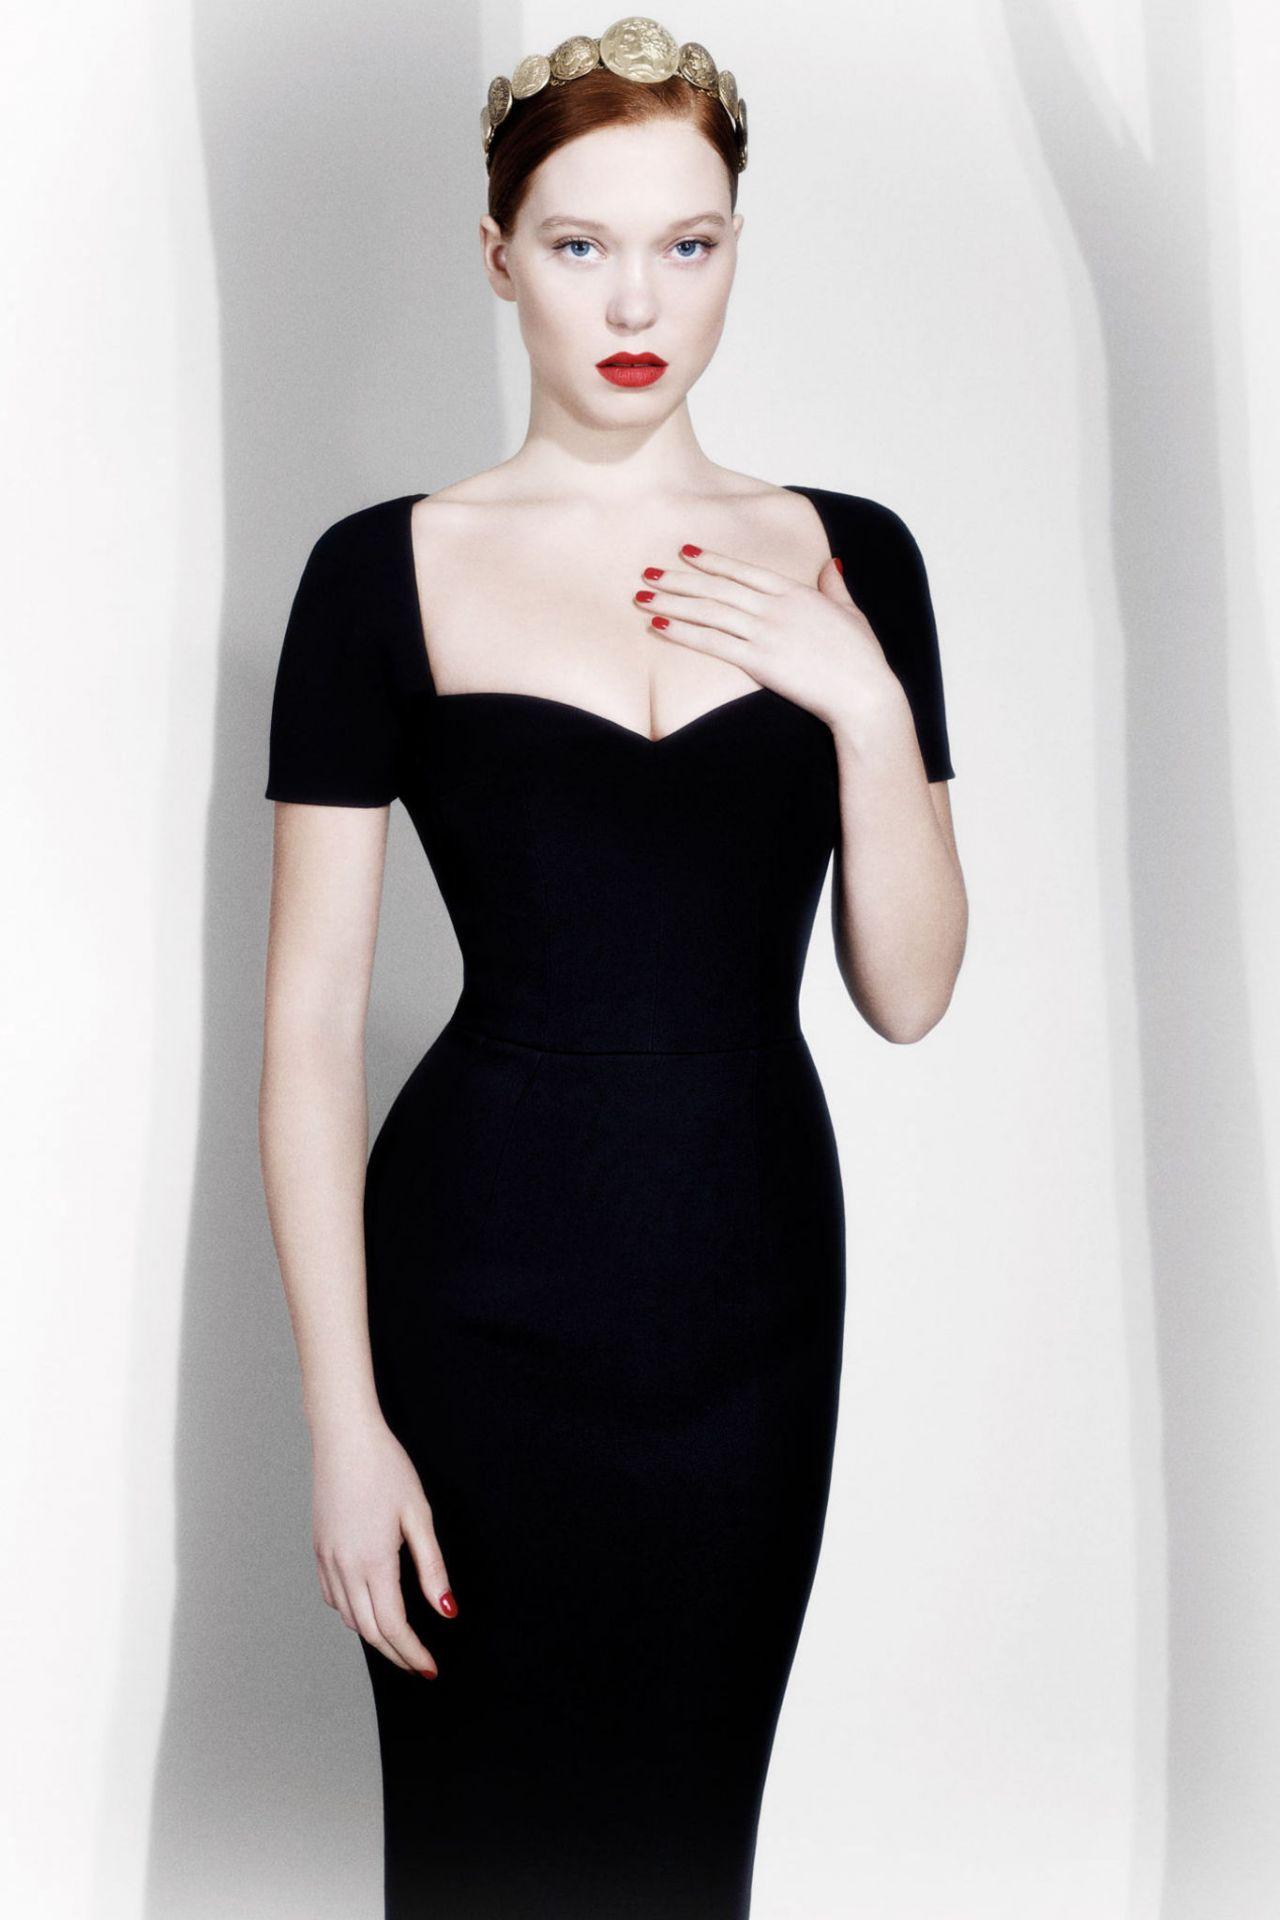 Lea Seydoux L Express Styles France Luciana Val